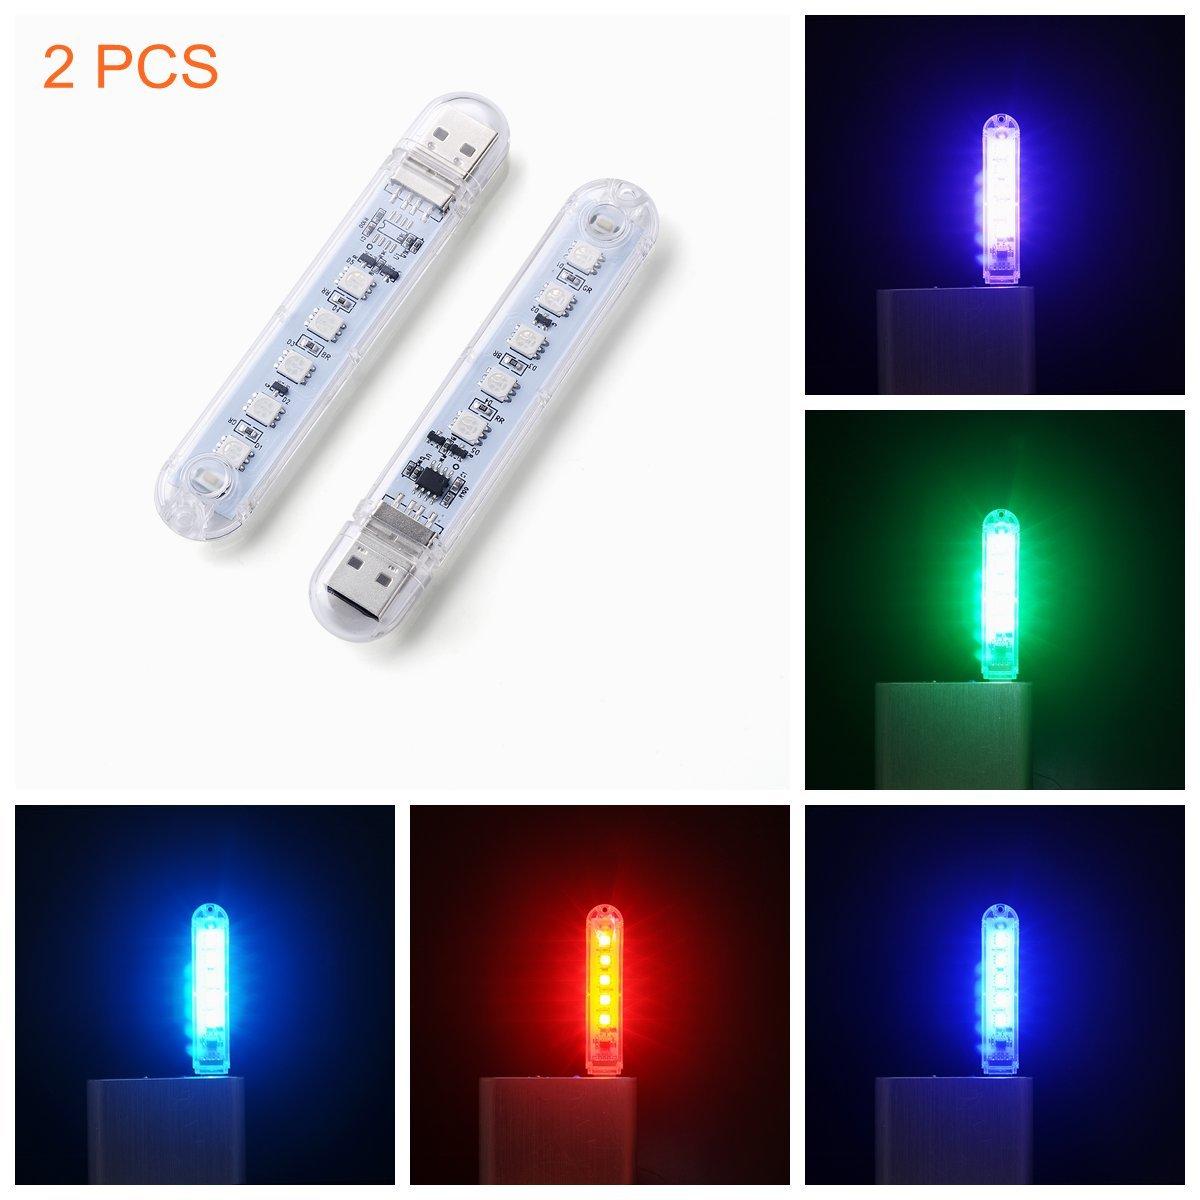 Ebyphan Portable Night Light Kids, Mini USB Led Lights, Modern Smart Novelty Lamps, Touch Switch Colorful RBG Bulbs, 9 Color Modes Adjustable, 2PCS